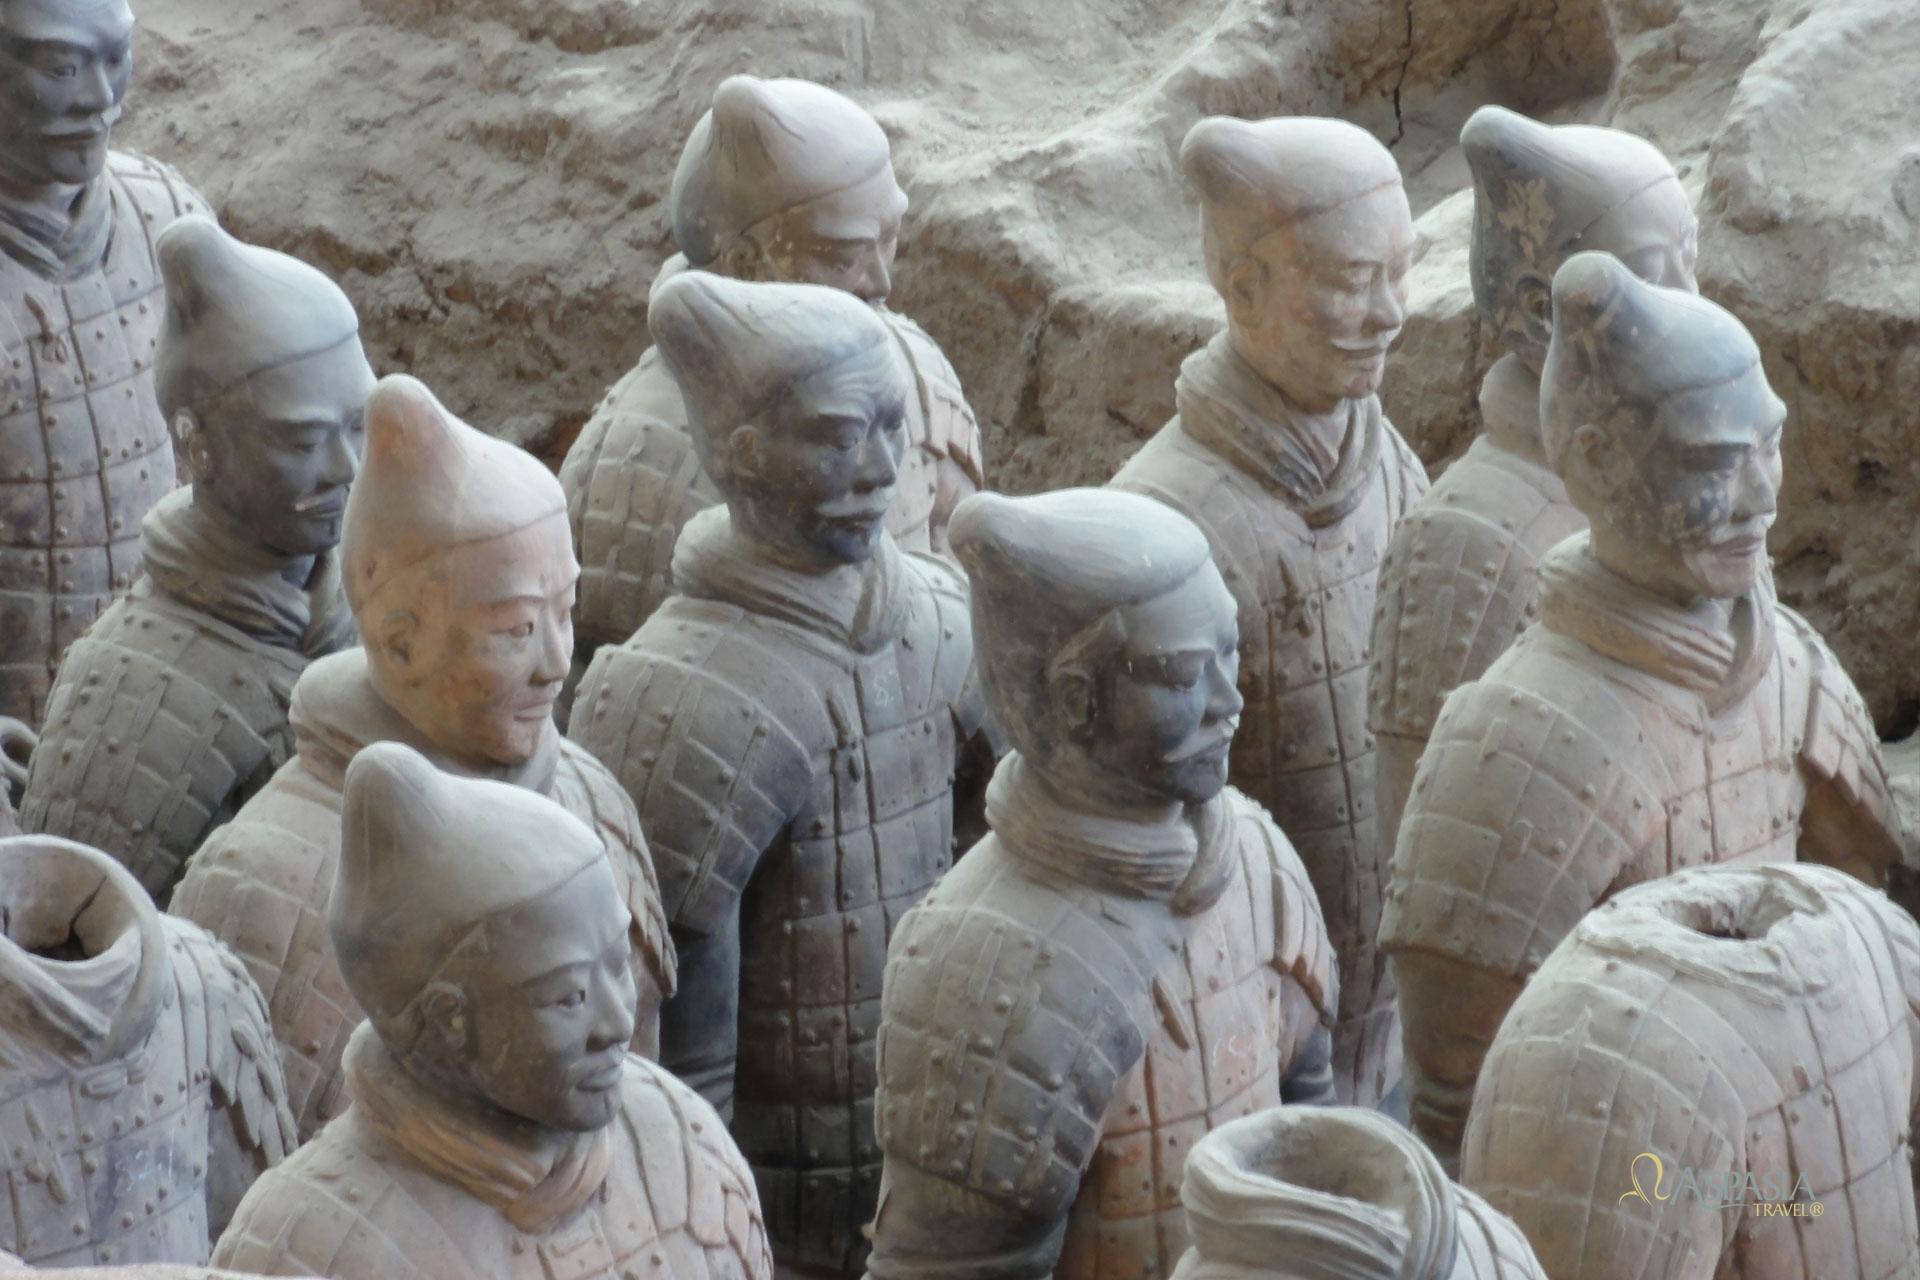 De china imperial al jap n tradicional aspasiatravel for Imagenes de futones